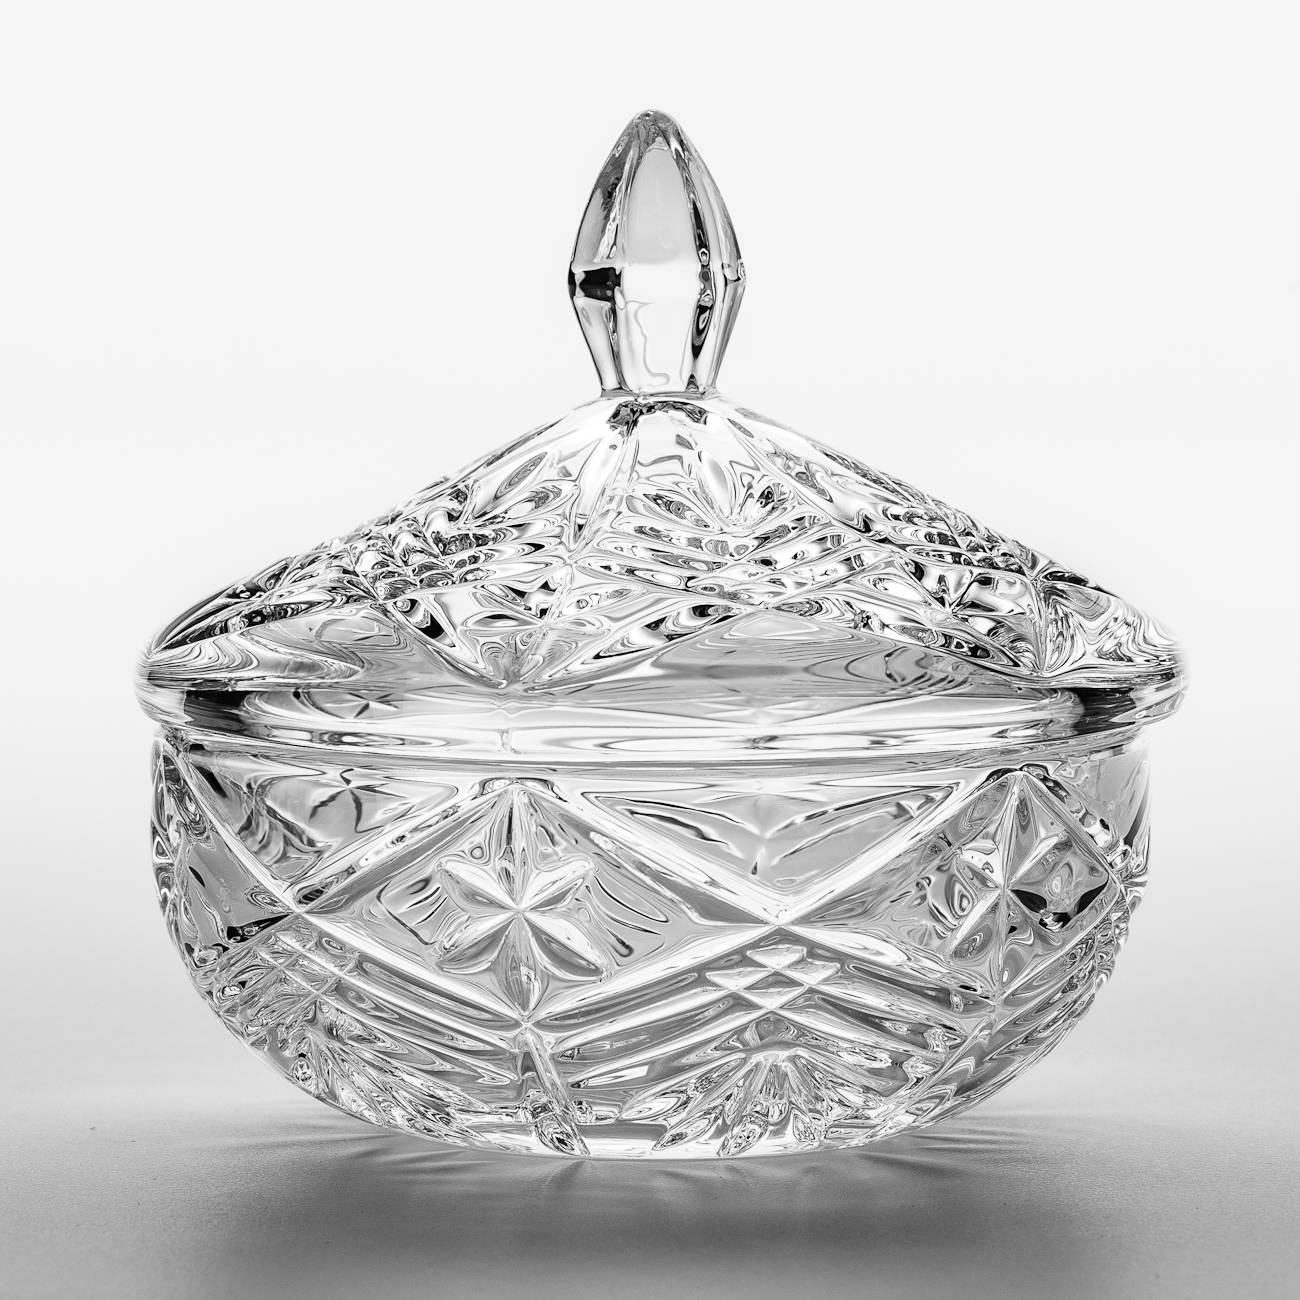 Bomboniere Taurus com Tampa em Cristal - Bohemia Crystalite - 15 cm